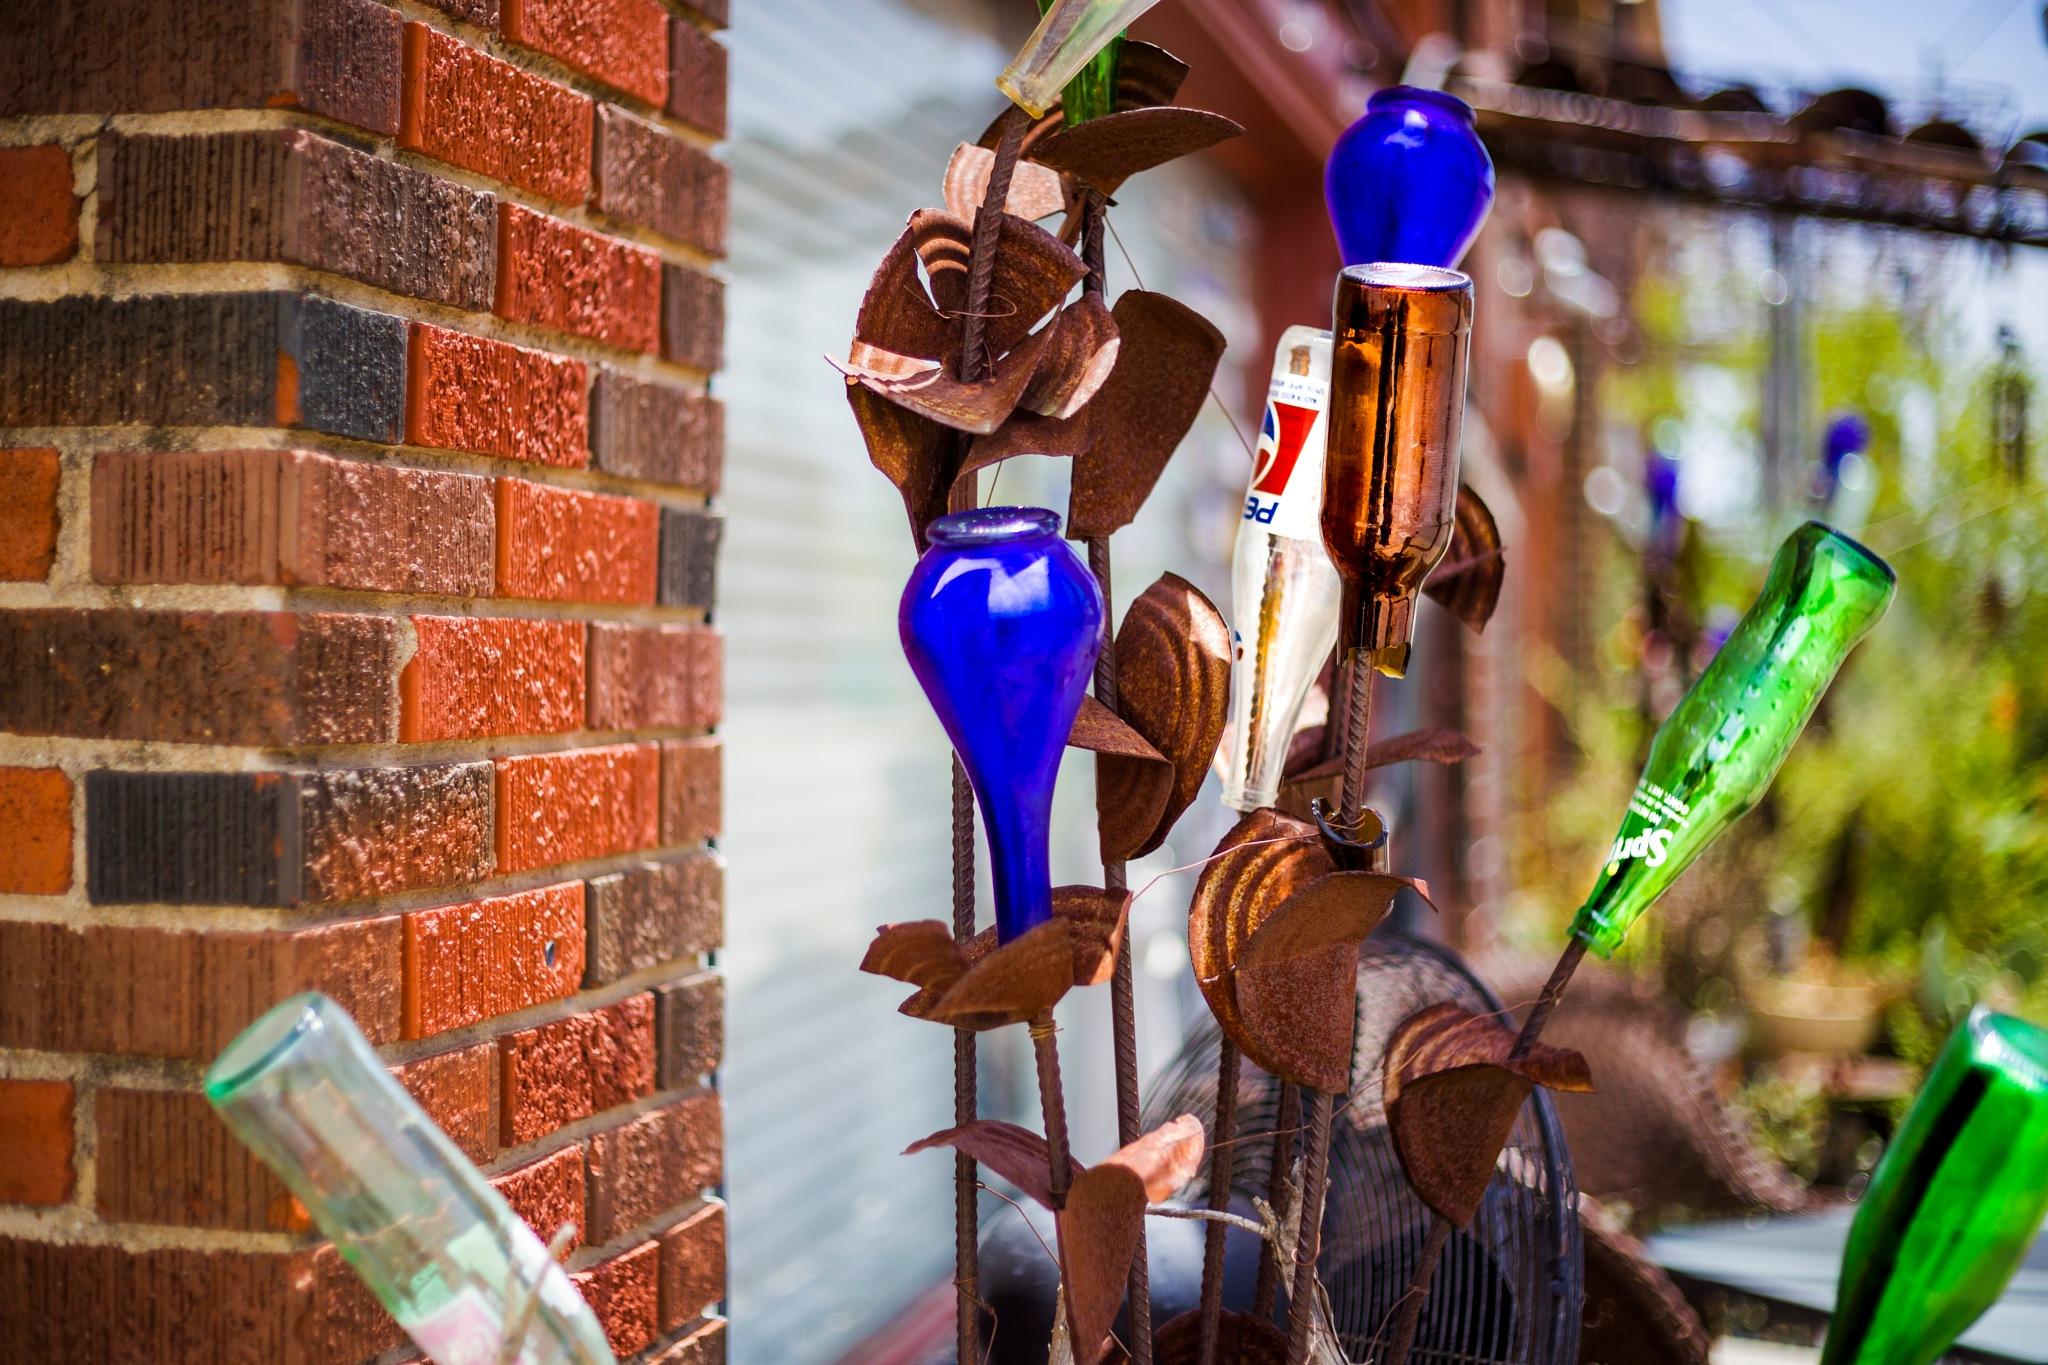 Bottles by Lane L Gibson